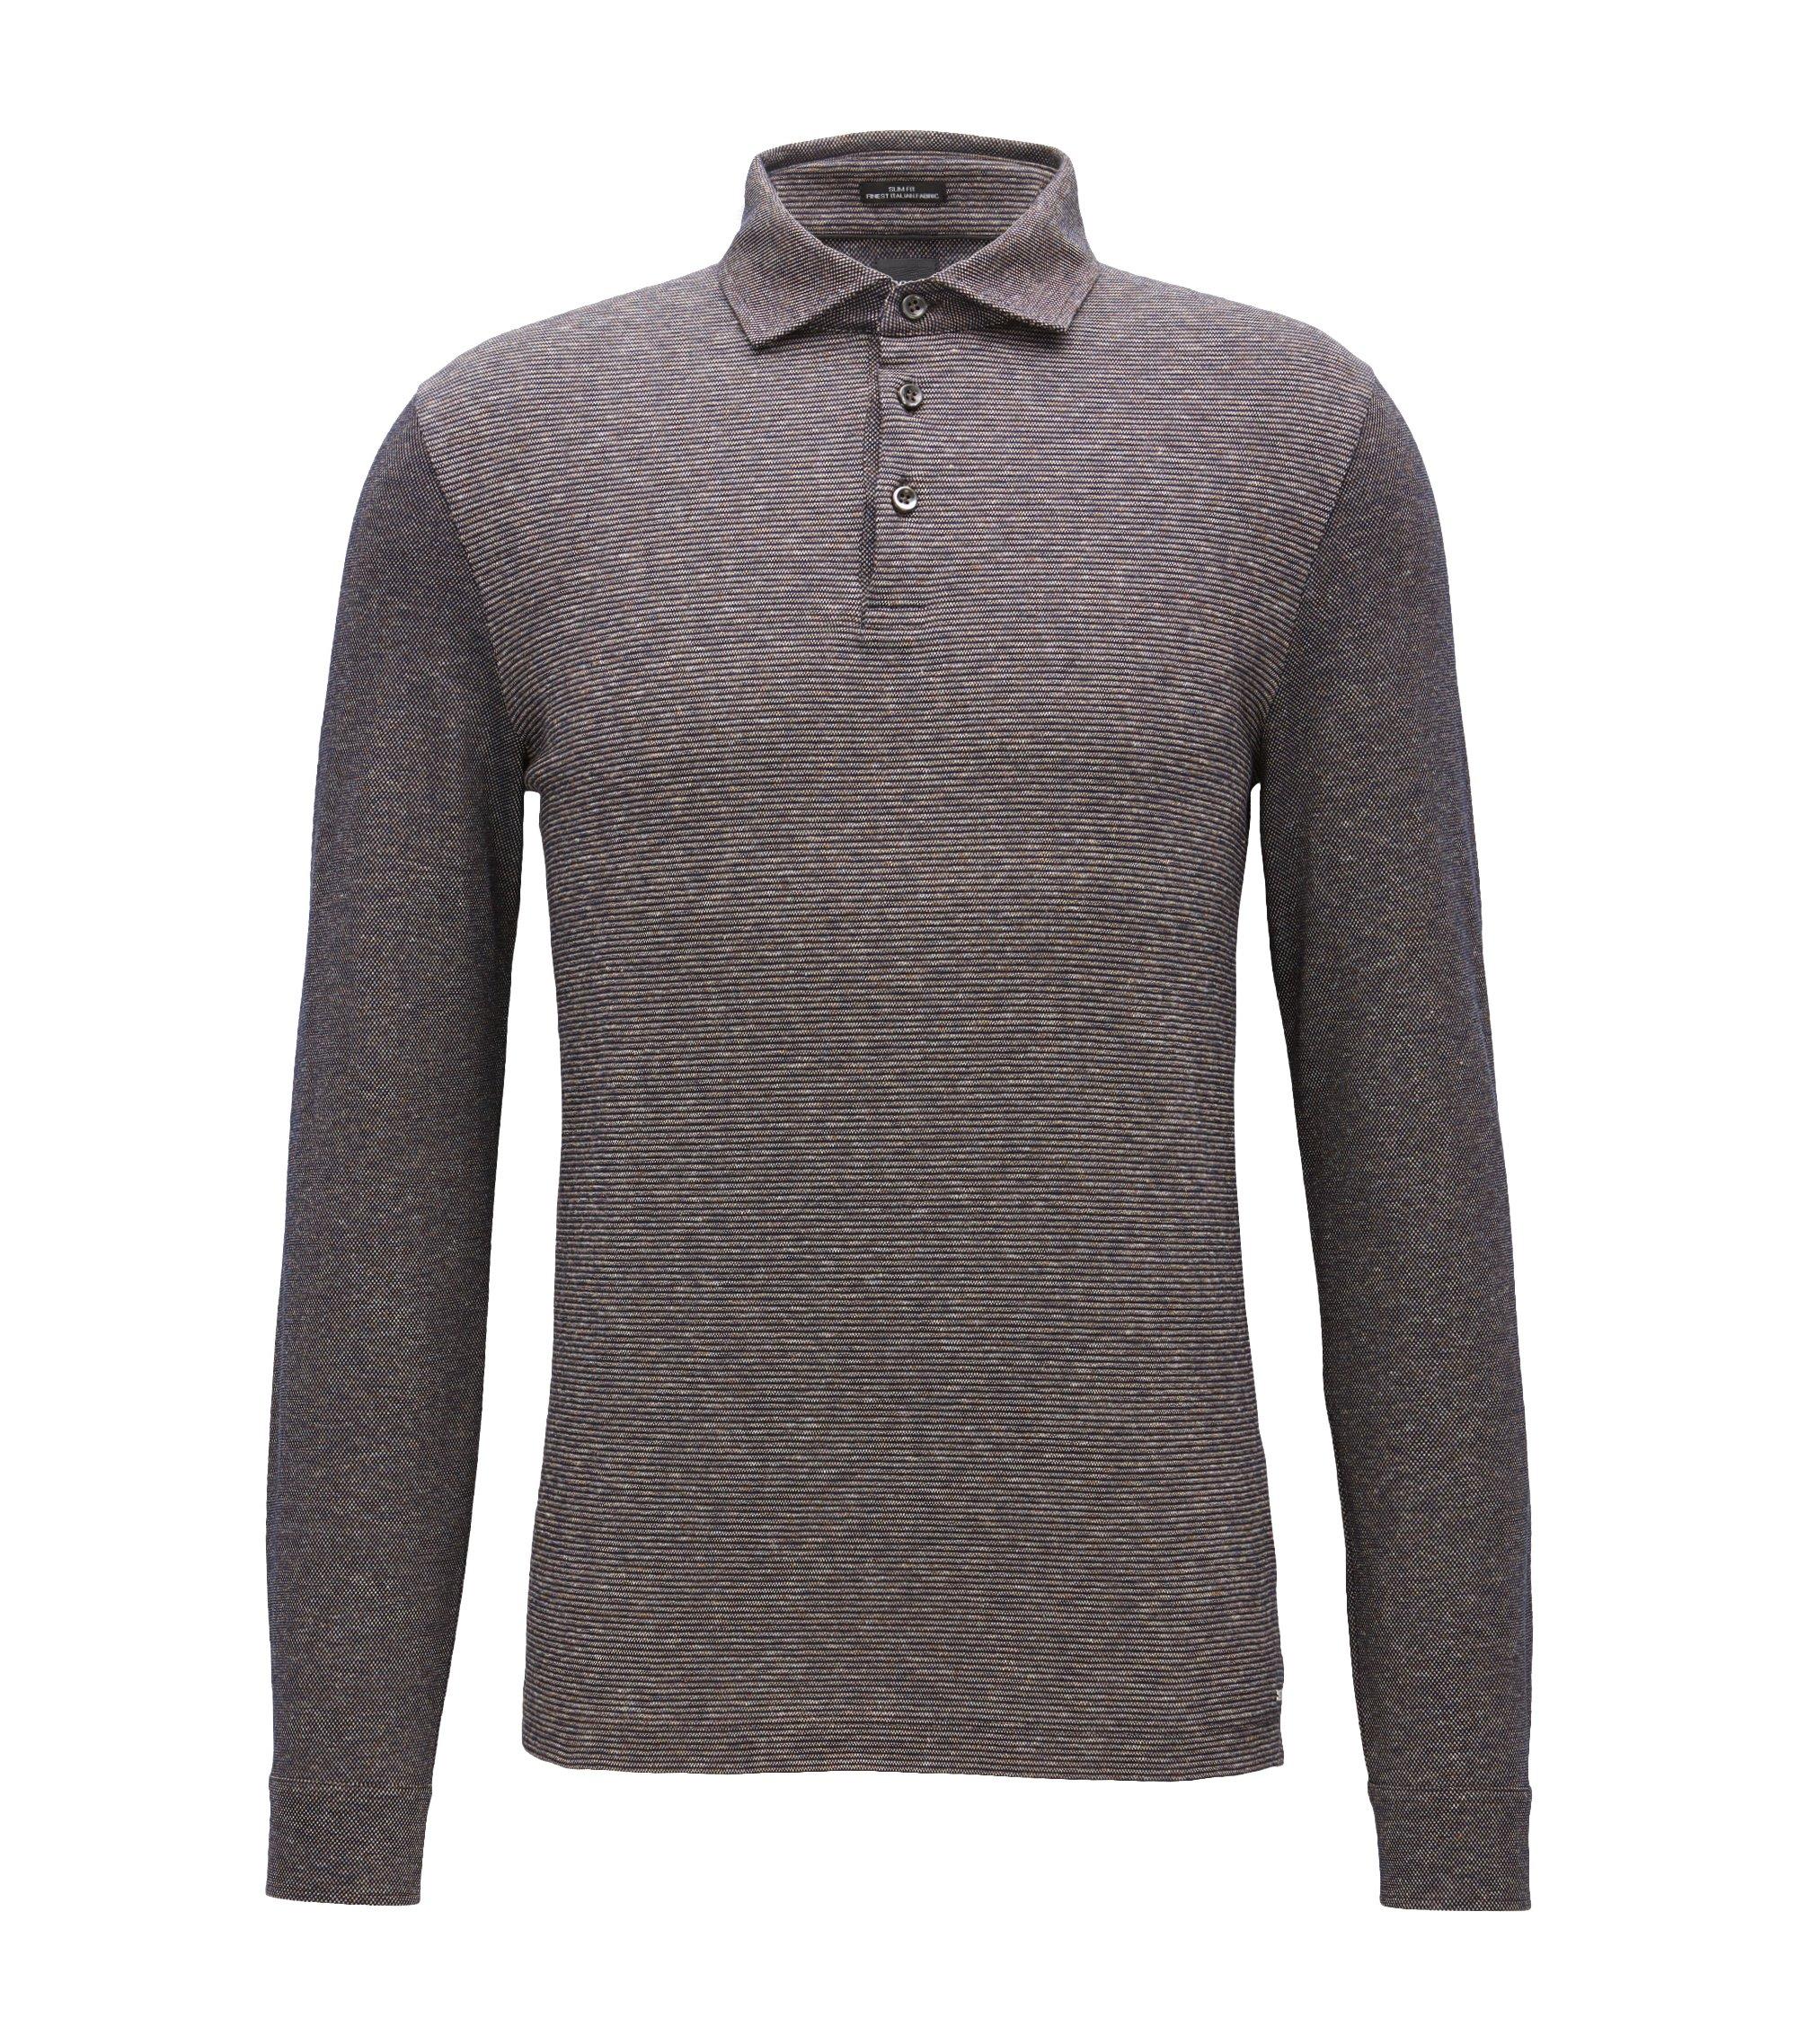 Slim-Fit Longsleeve Poloshirt aus Baumwolle mit gestreiftem Jacquard, Braun